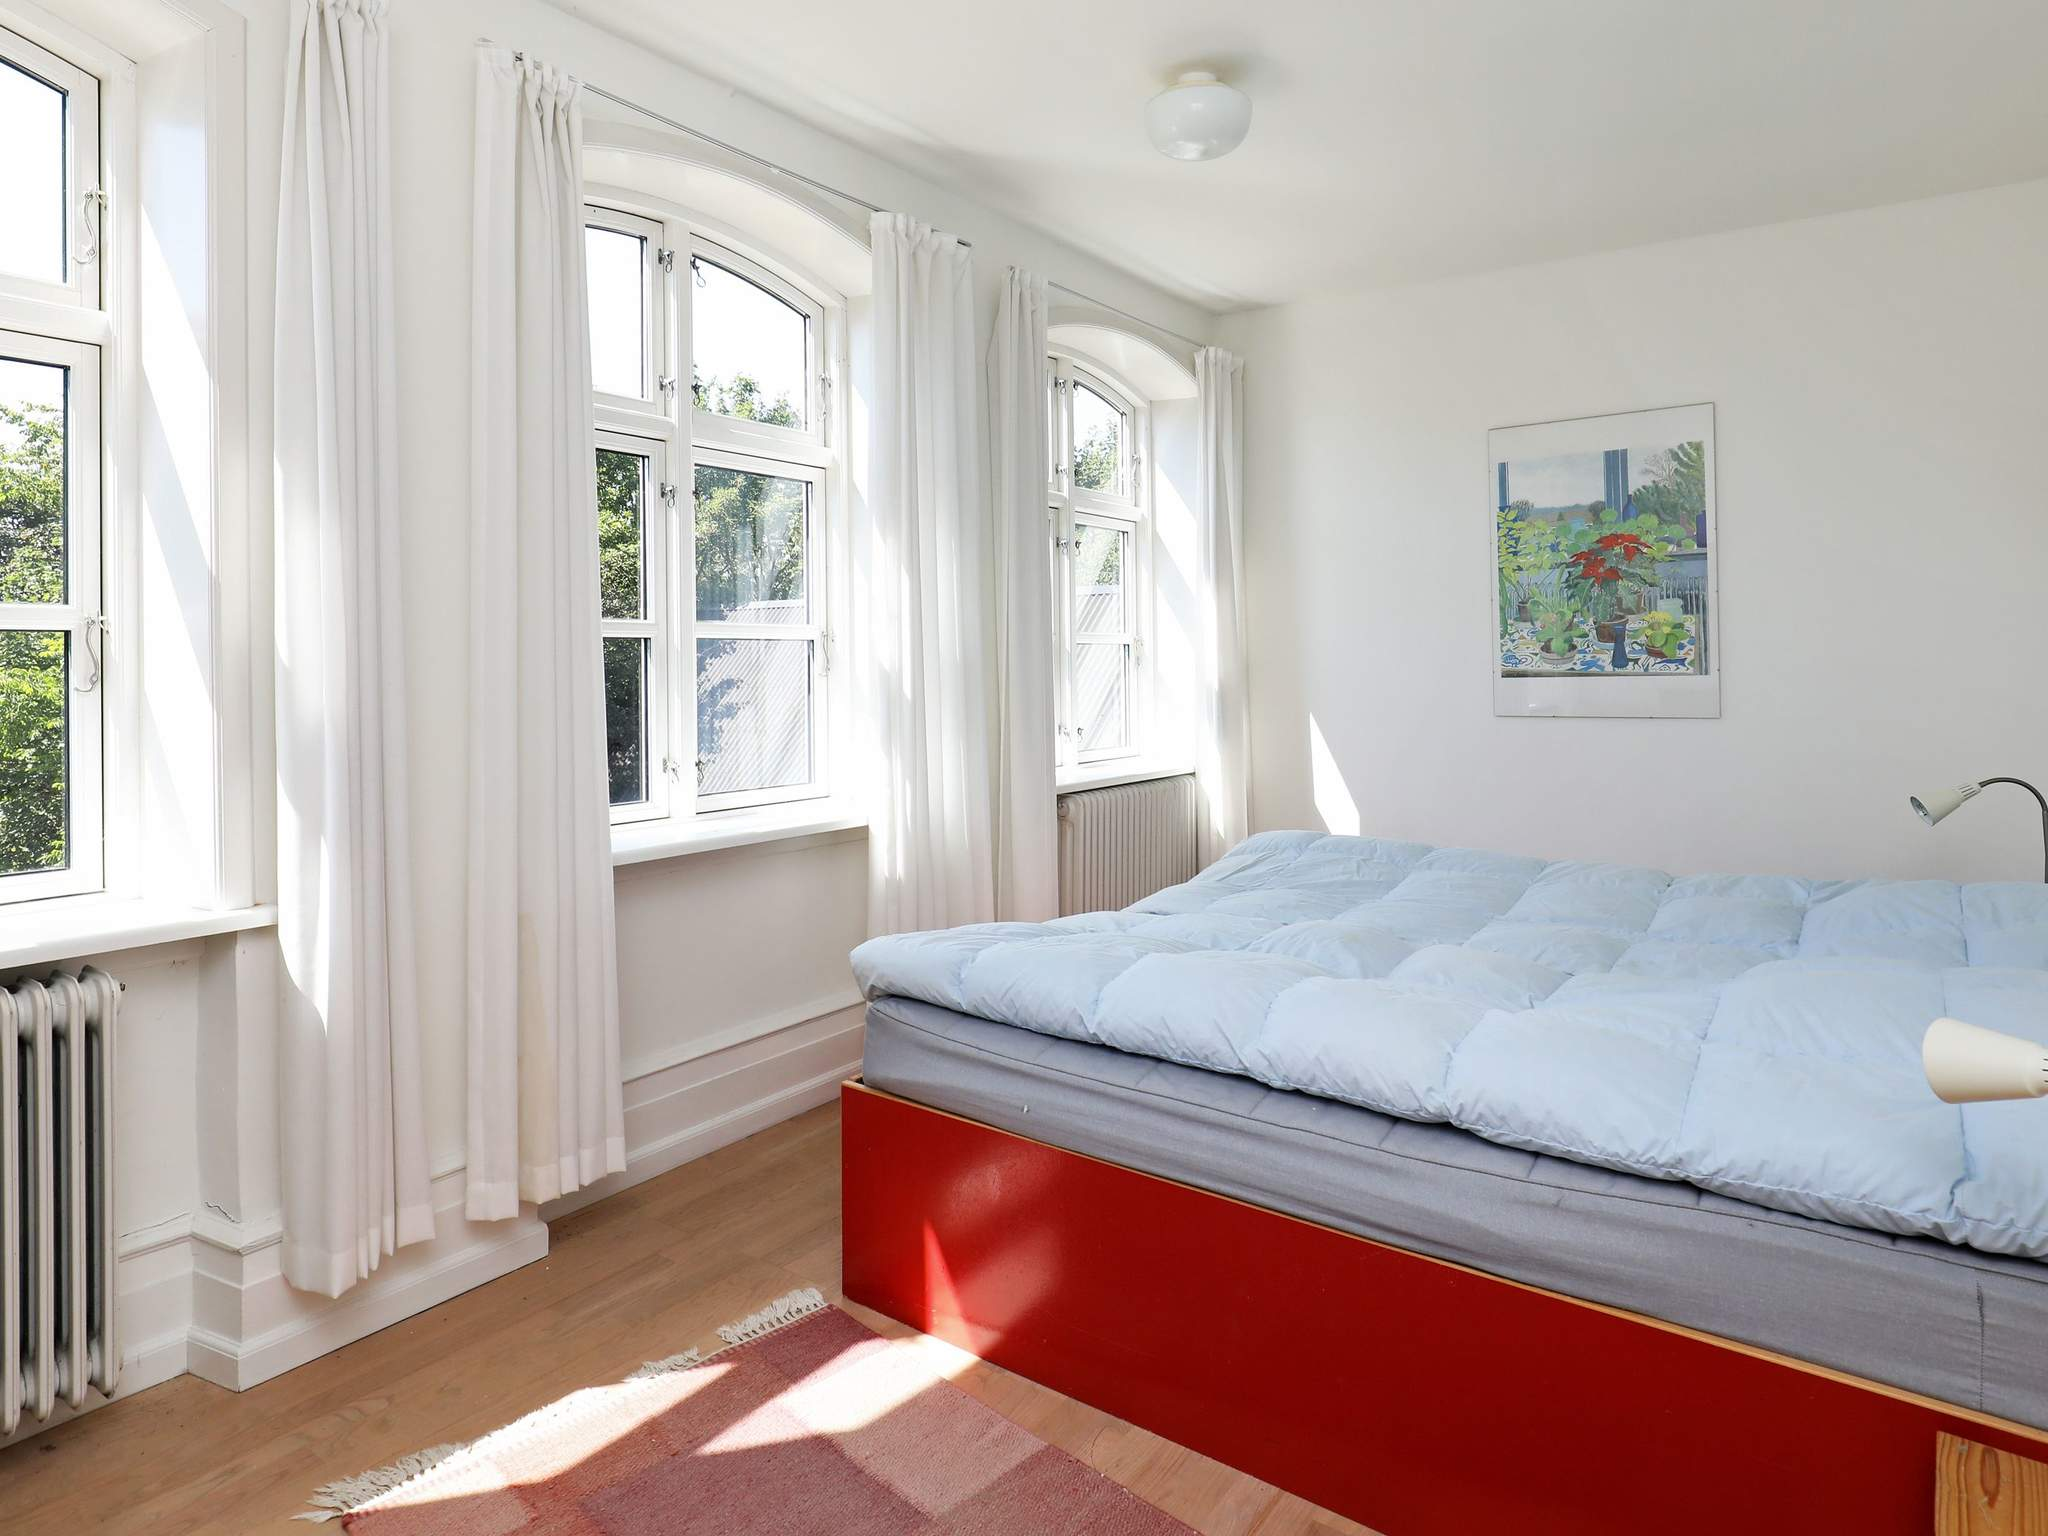 Ferienhaus Bukkemose (2453155), Humble, , Langeland, Dänemark, Bild 17